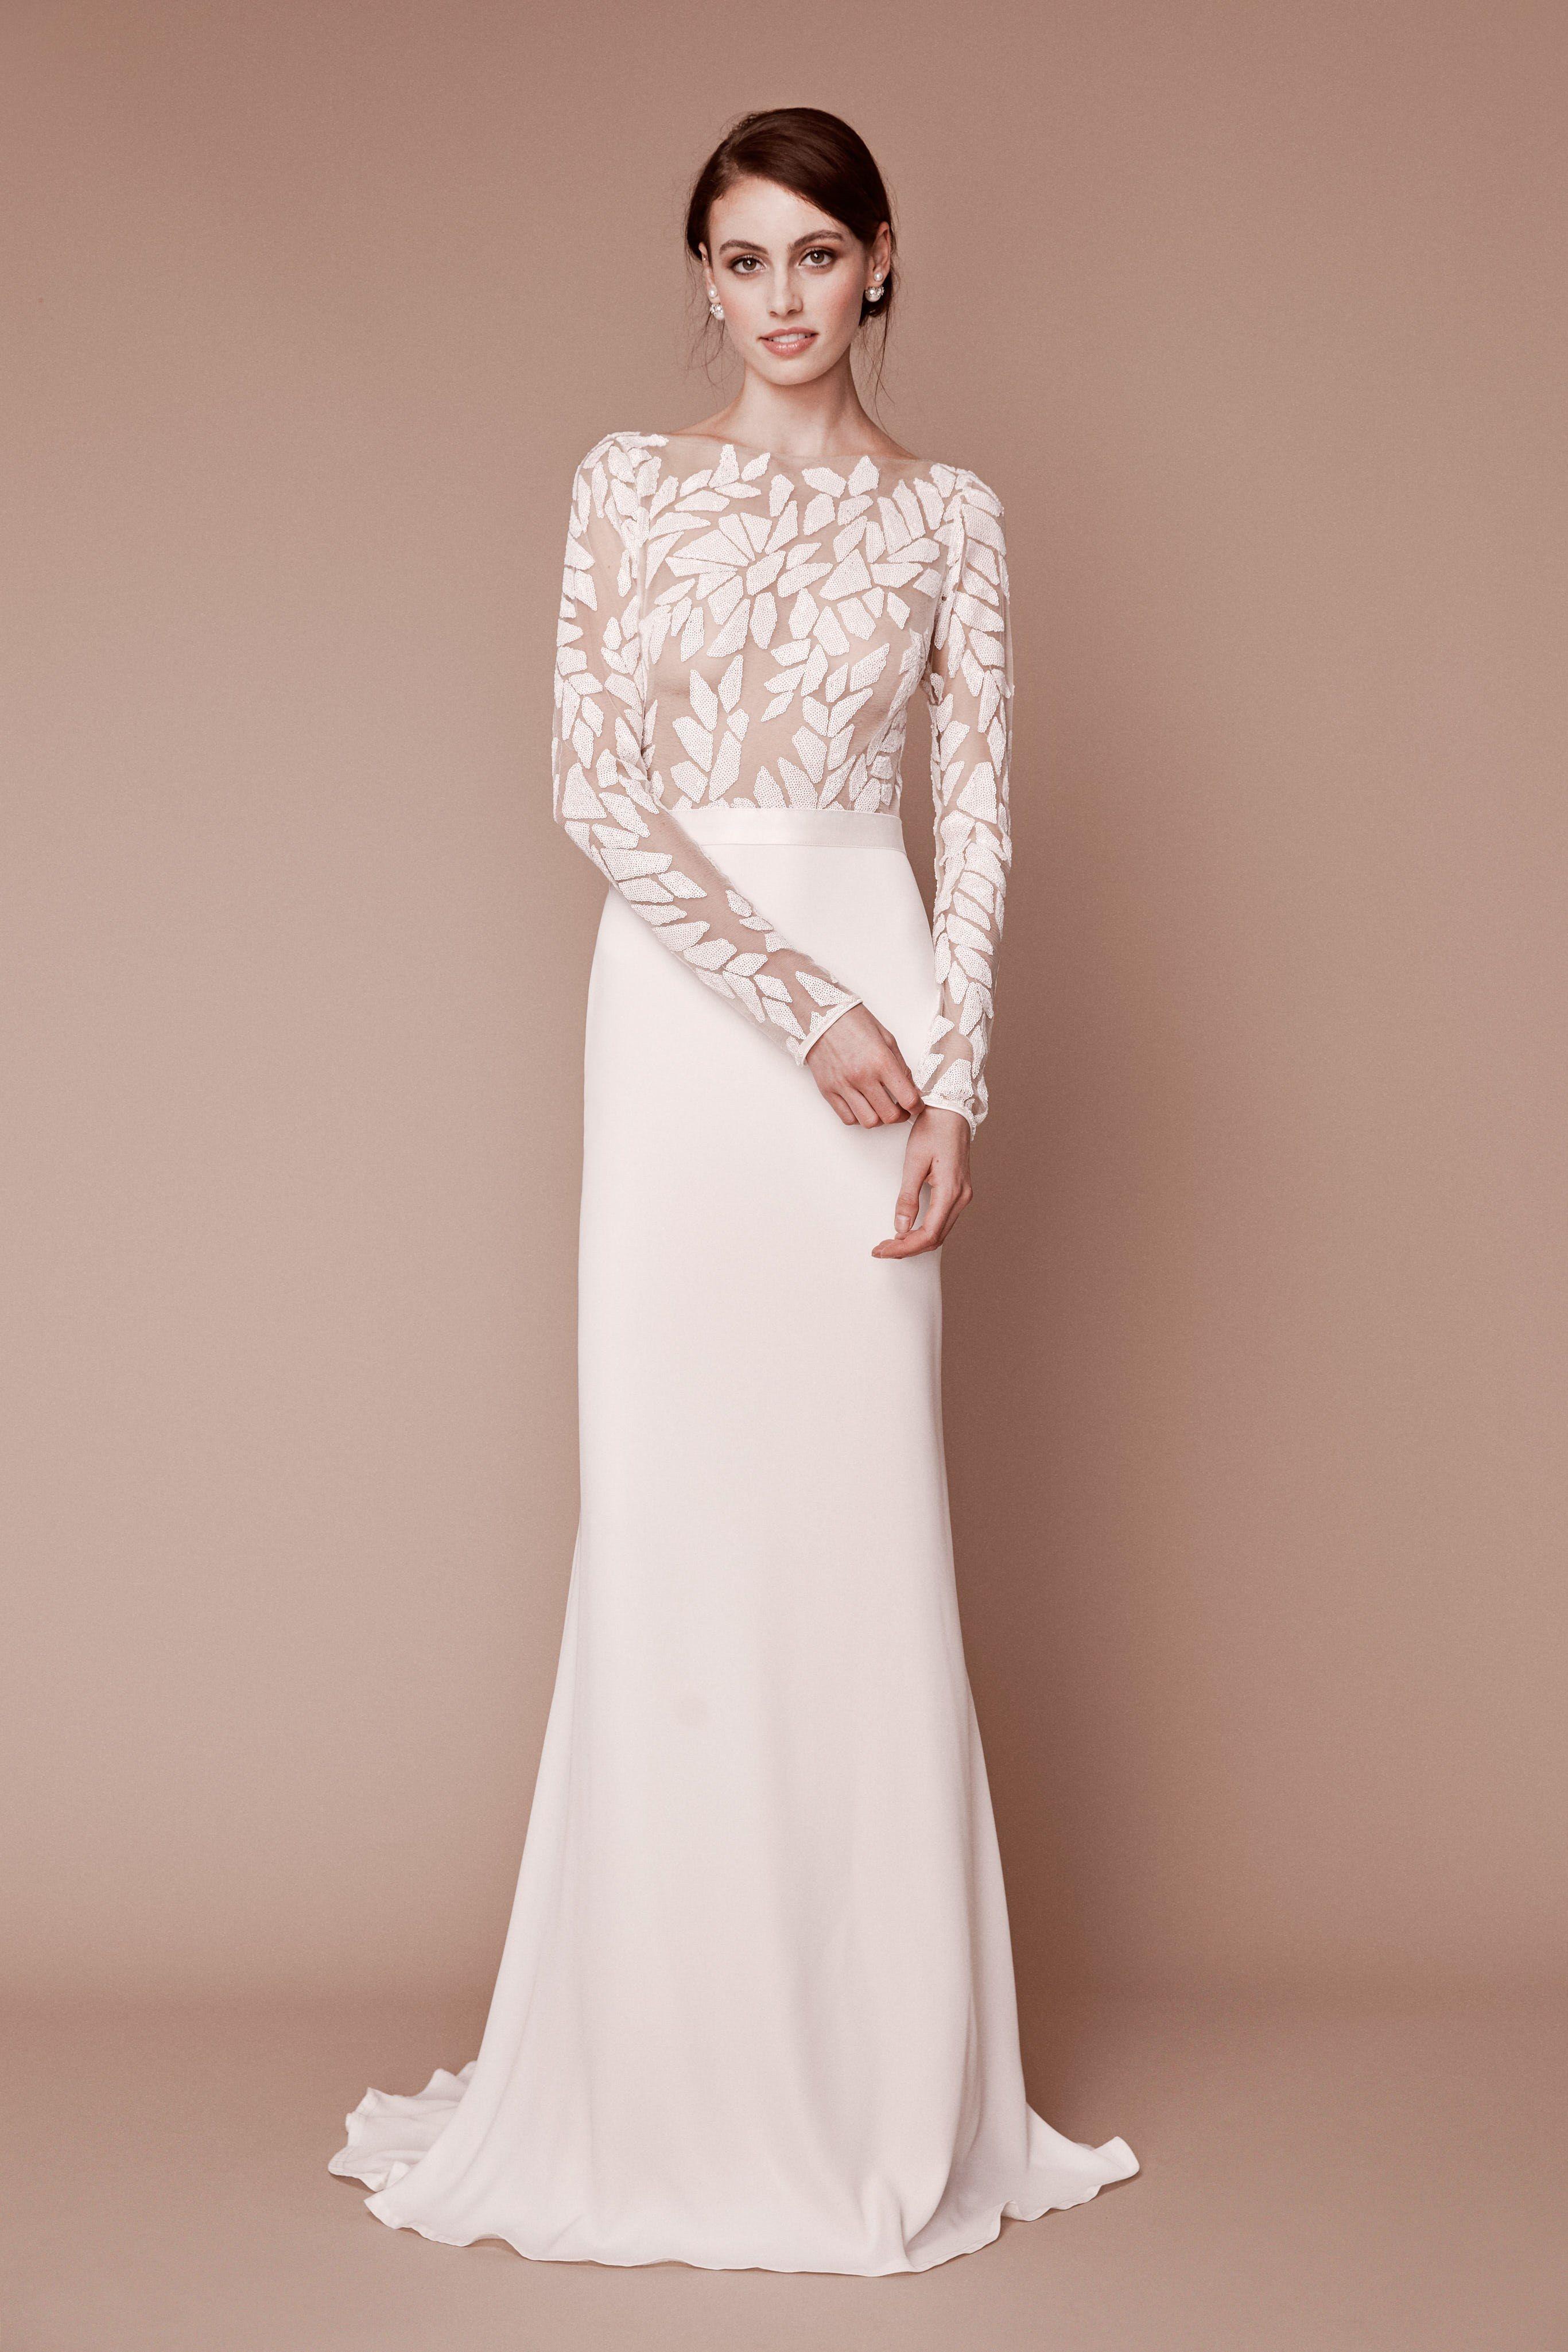 9887e17c268 Tadashi Shoji Bridal Fall 2019 Fashion Show in 2019